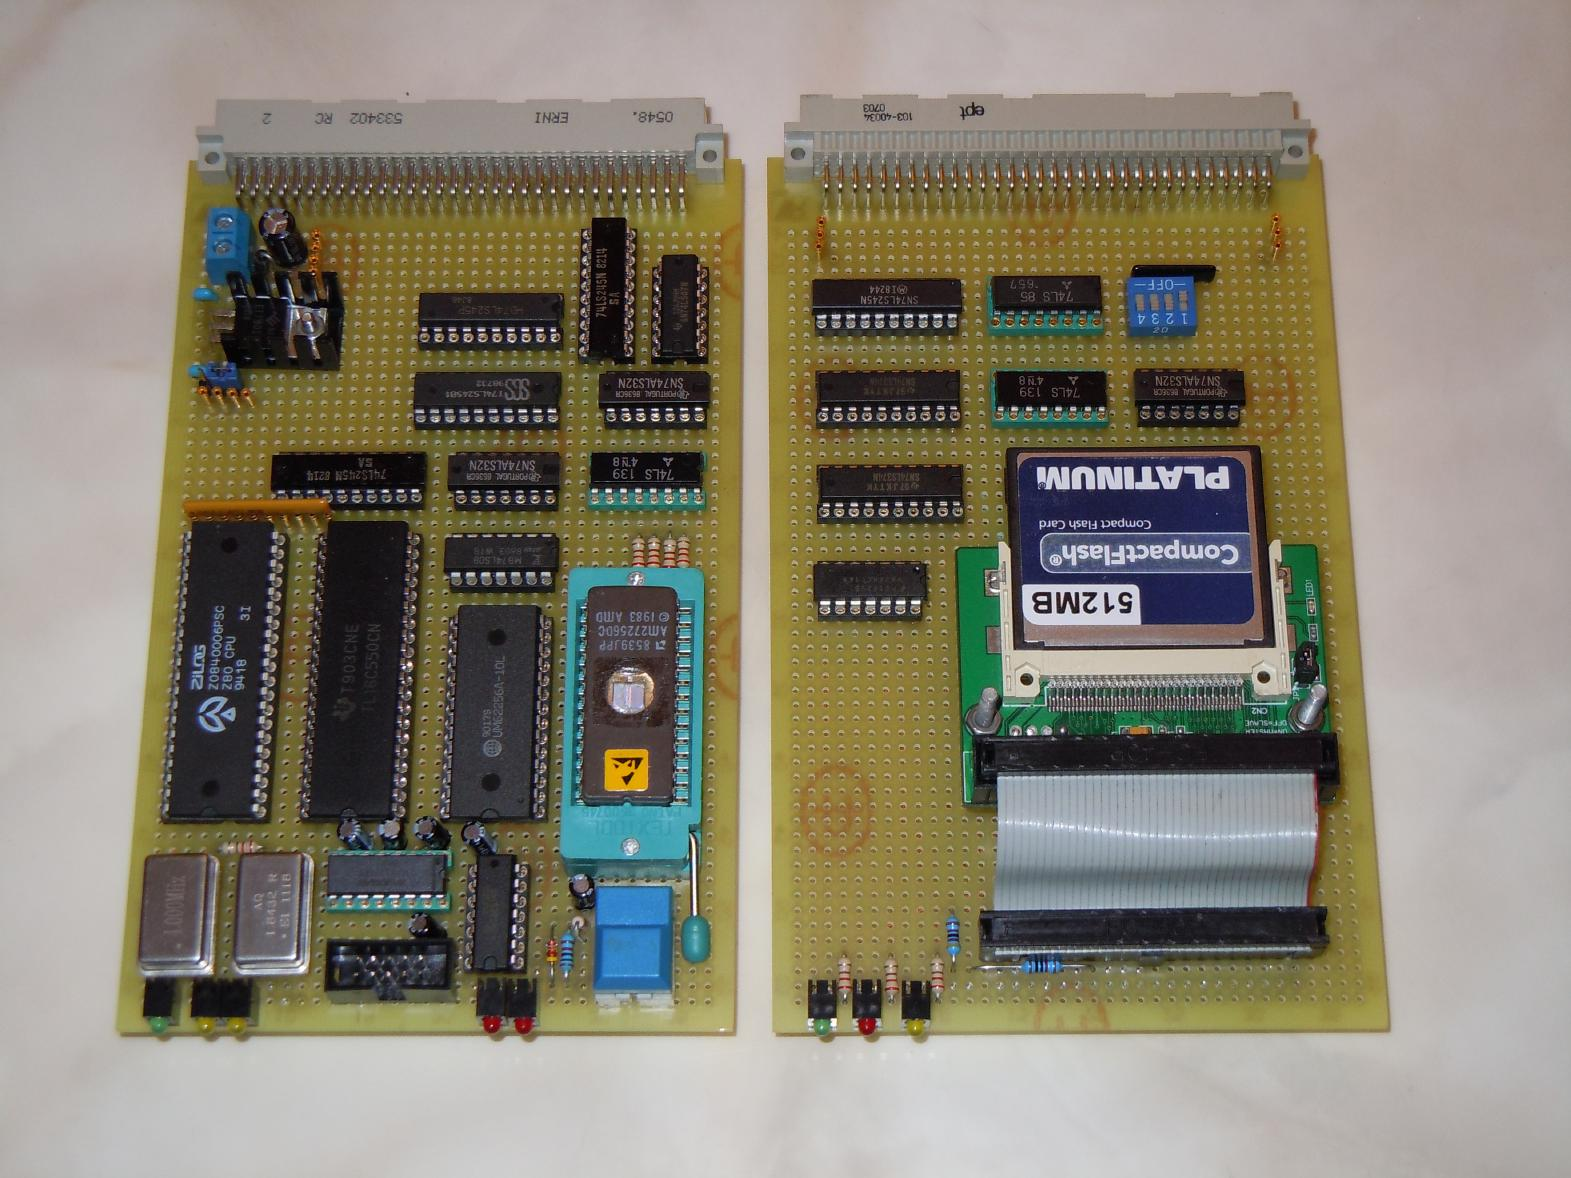 A tiny Z80 based computer